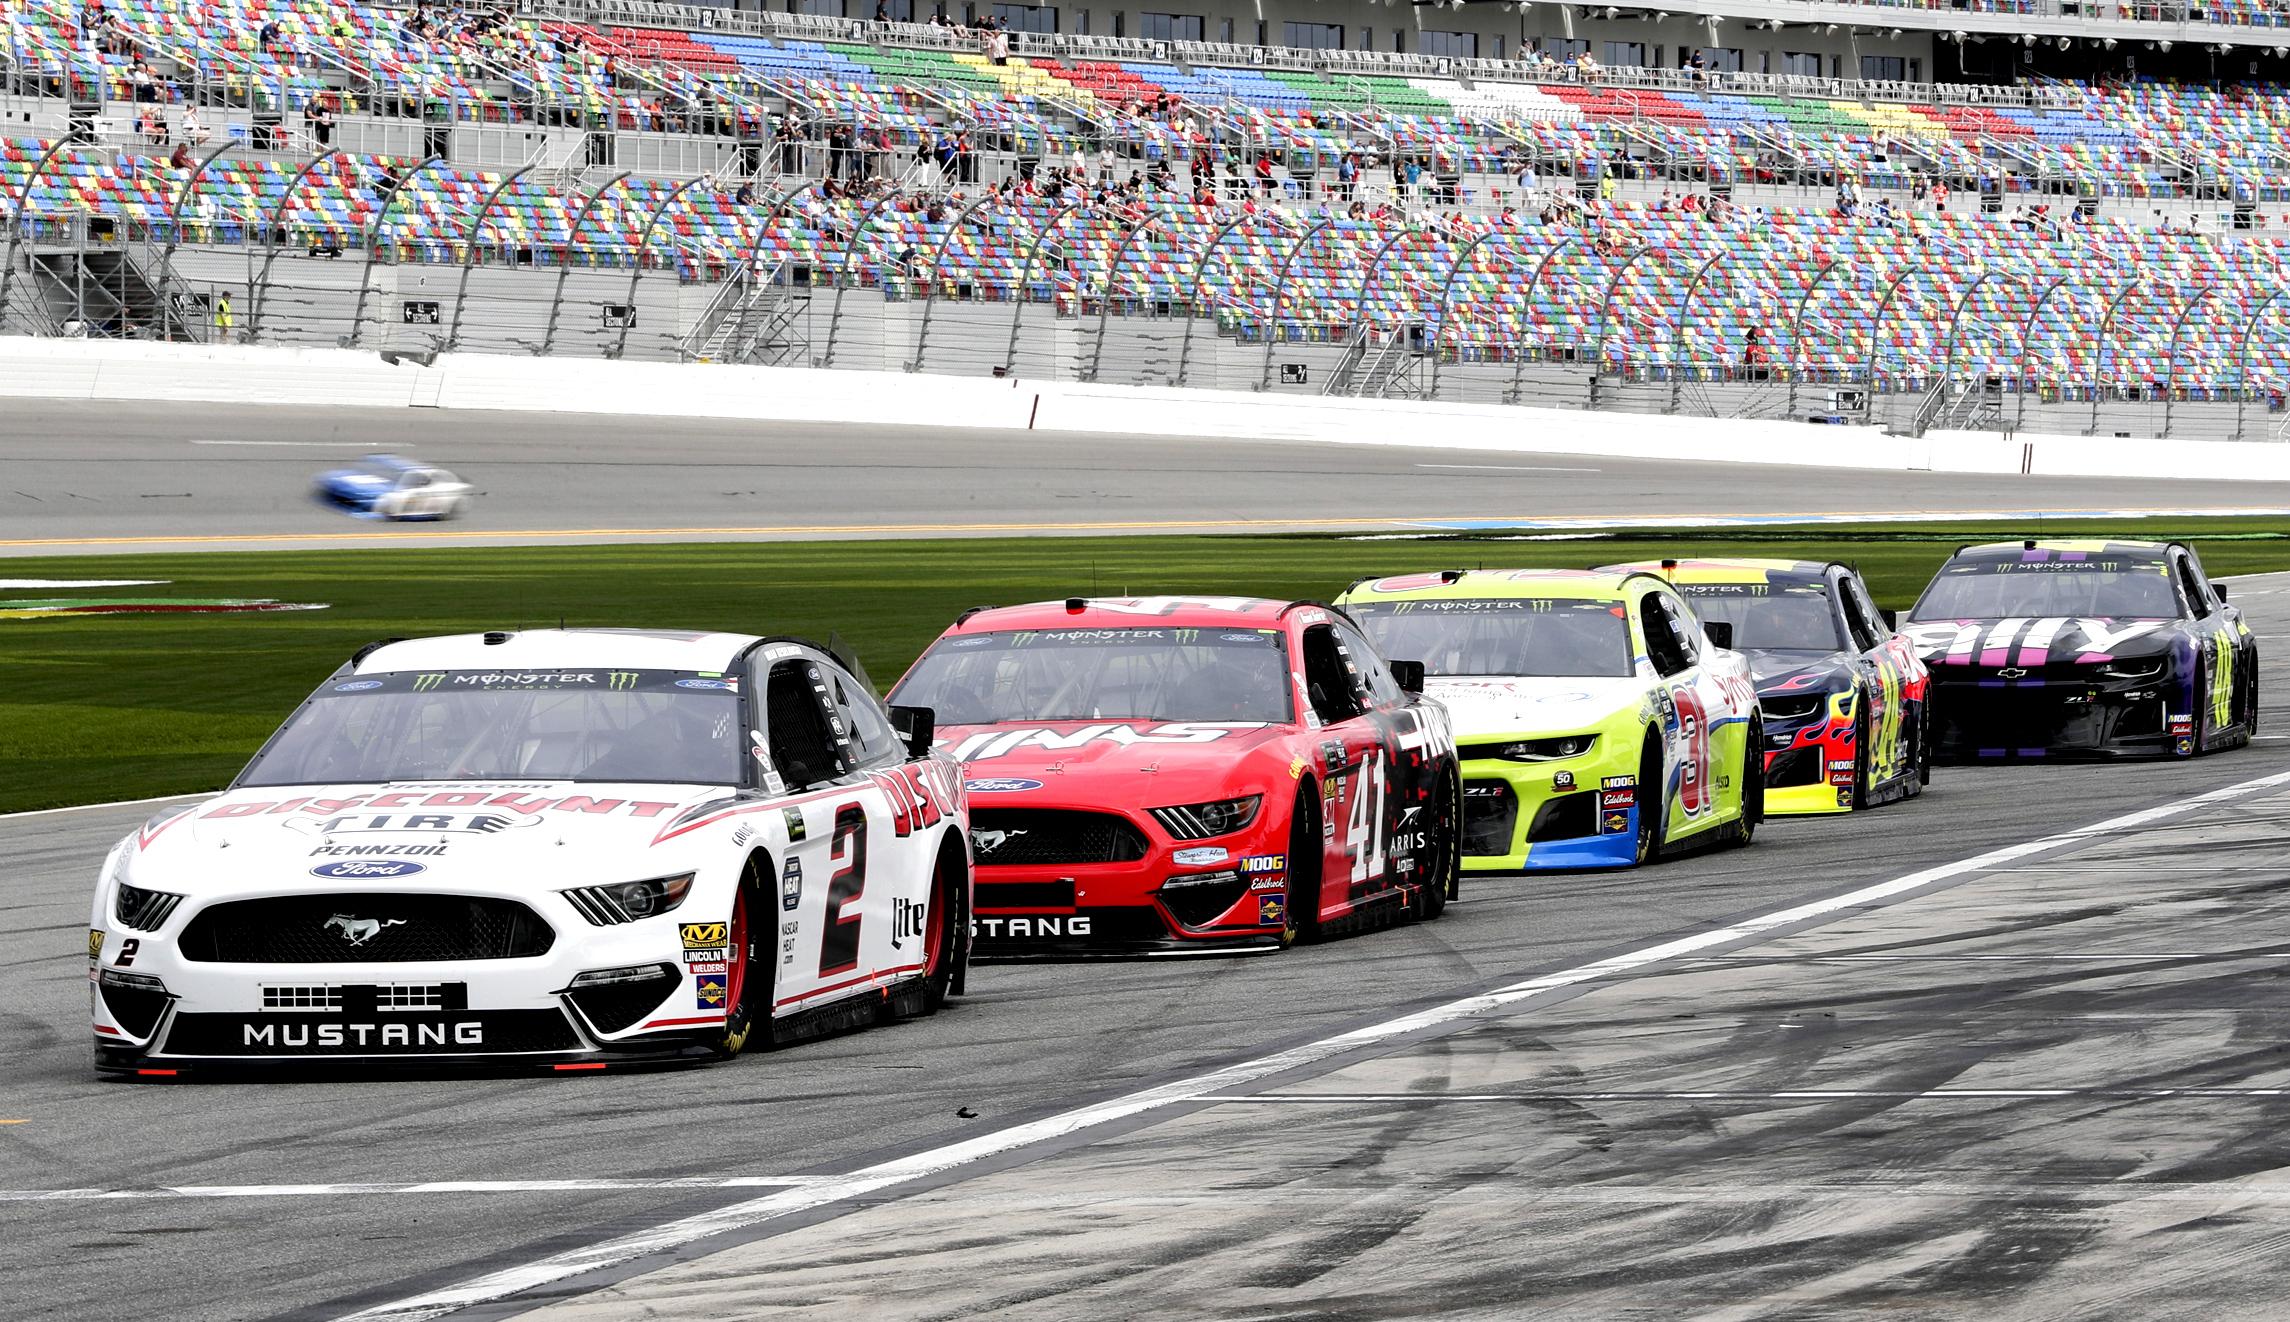 washingtonexaminer.com - NASCAR fans get the racing they deserve